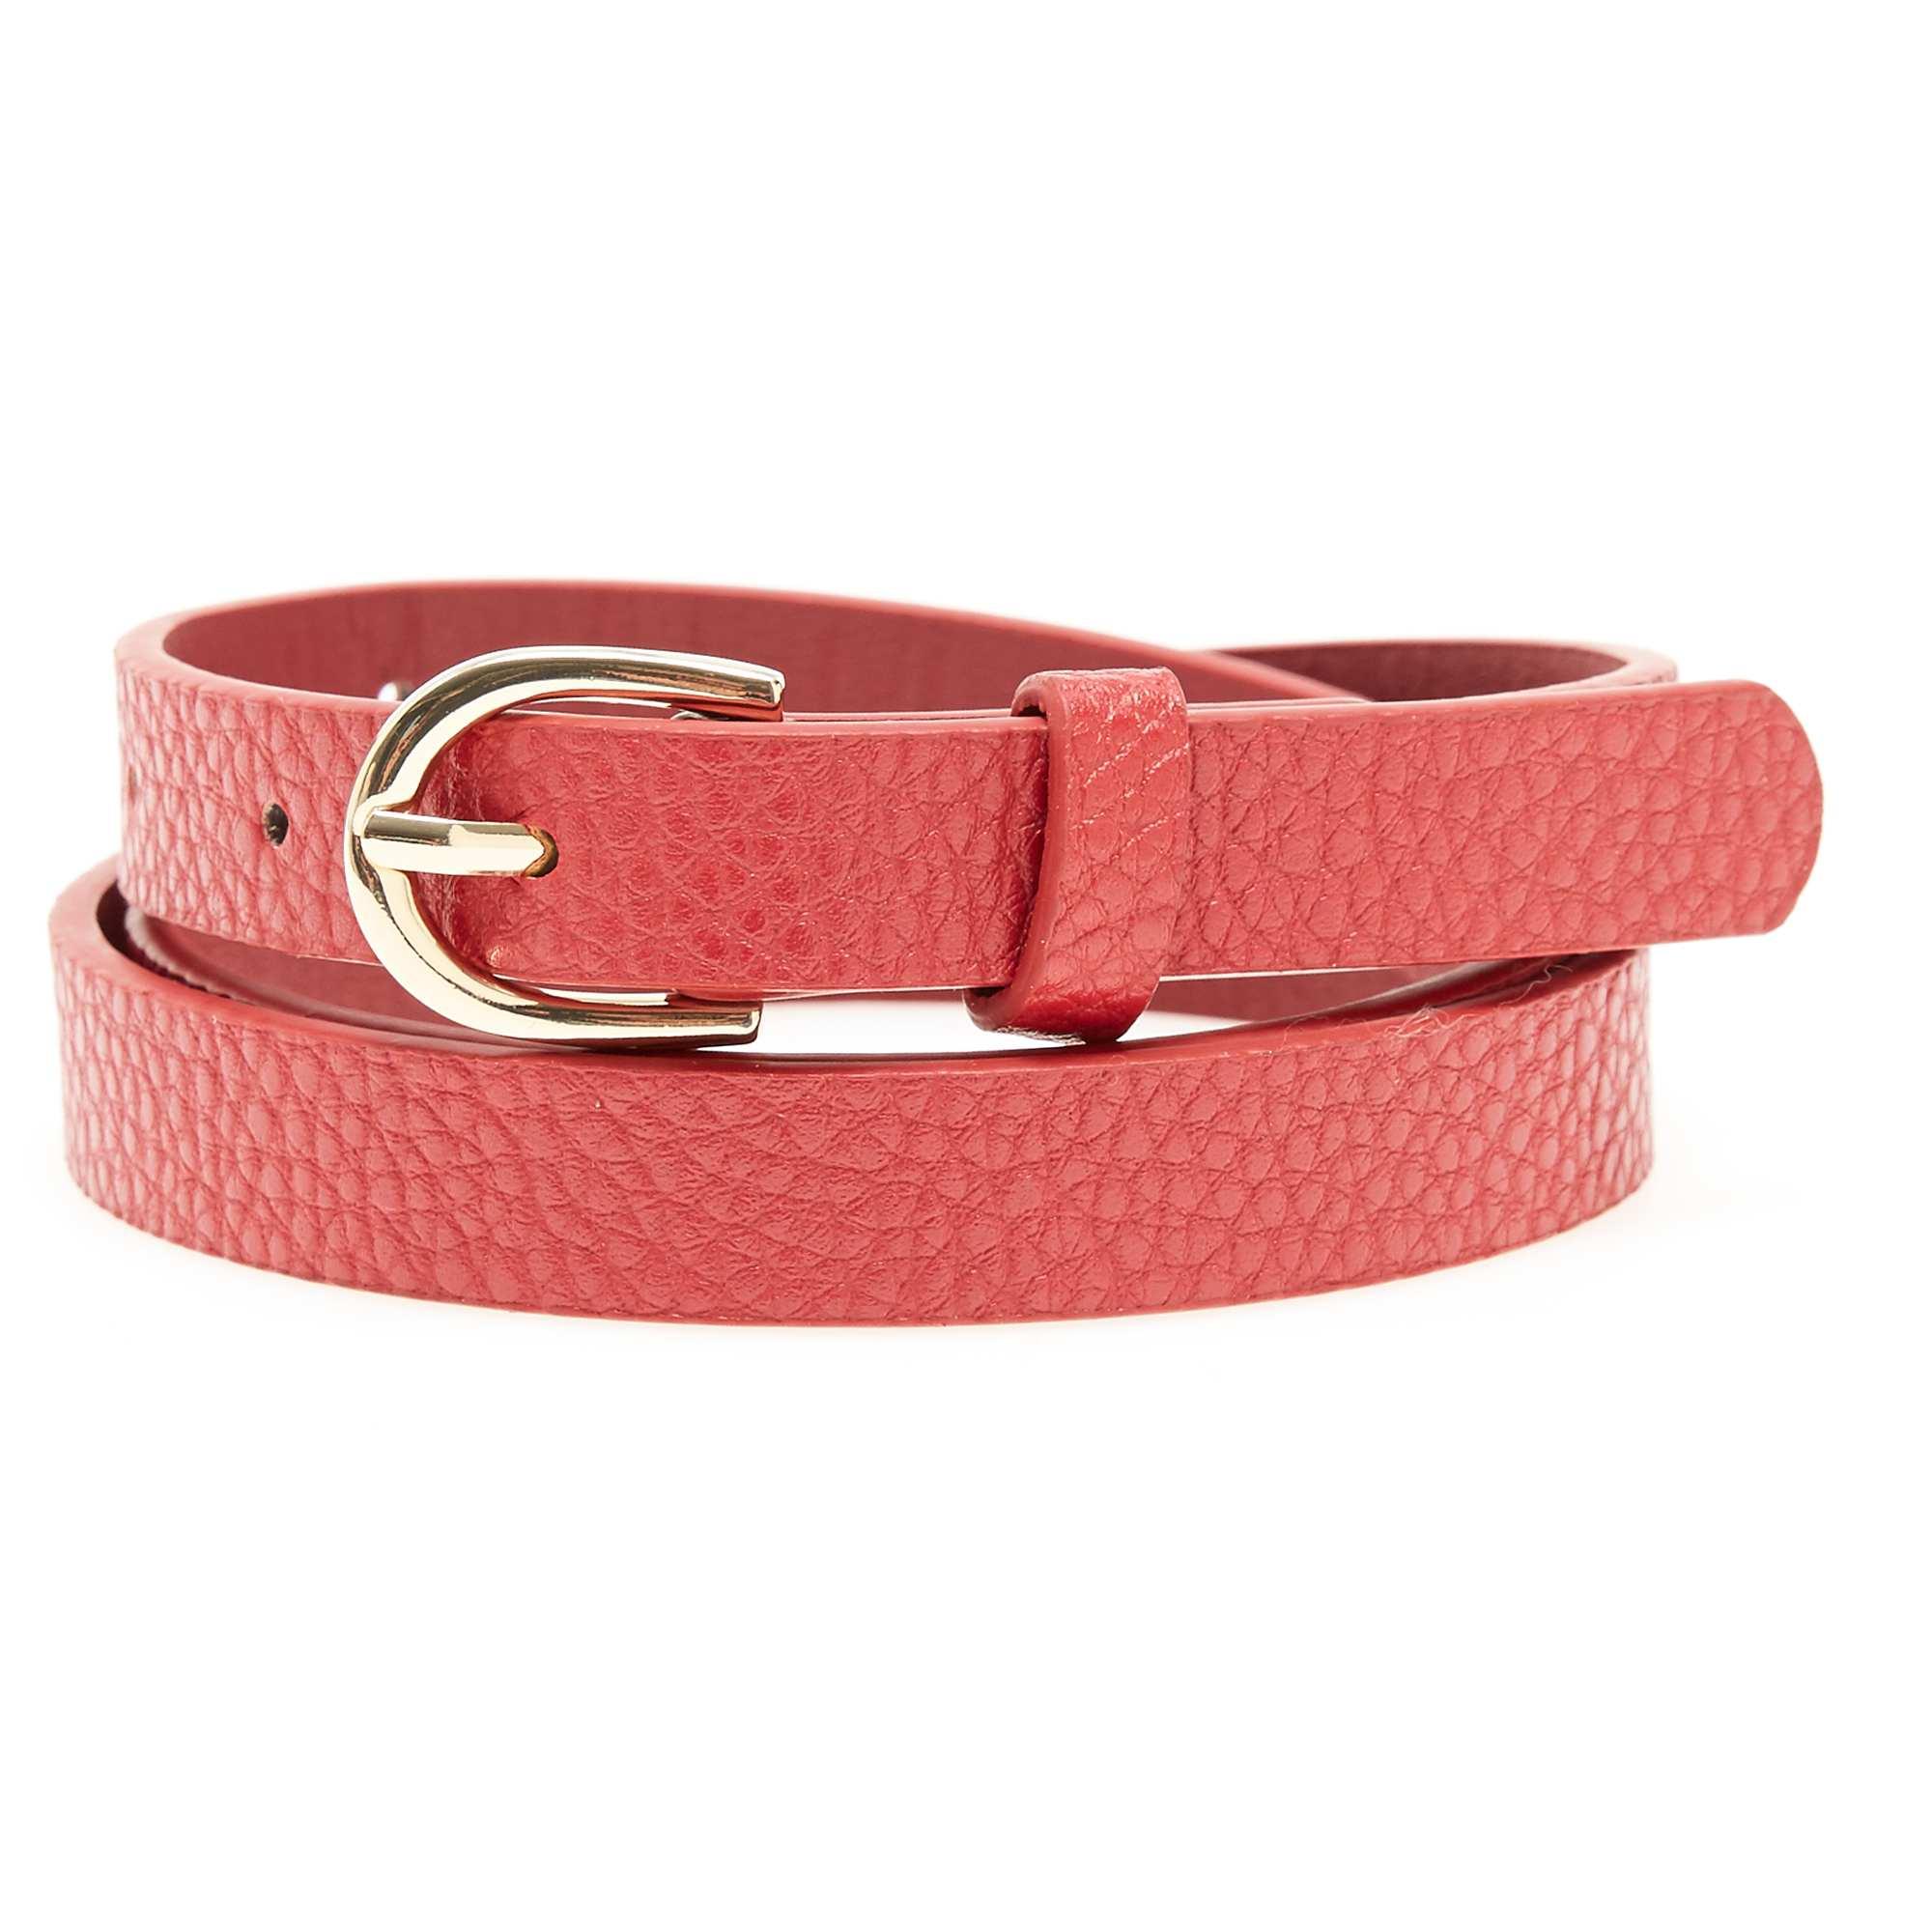 7cef2538b897 Fine ceinture Femme - rouge - Kiabi - 3,00€